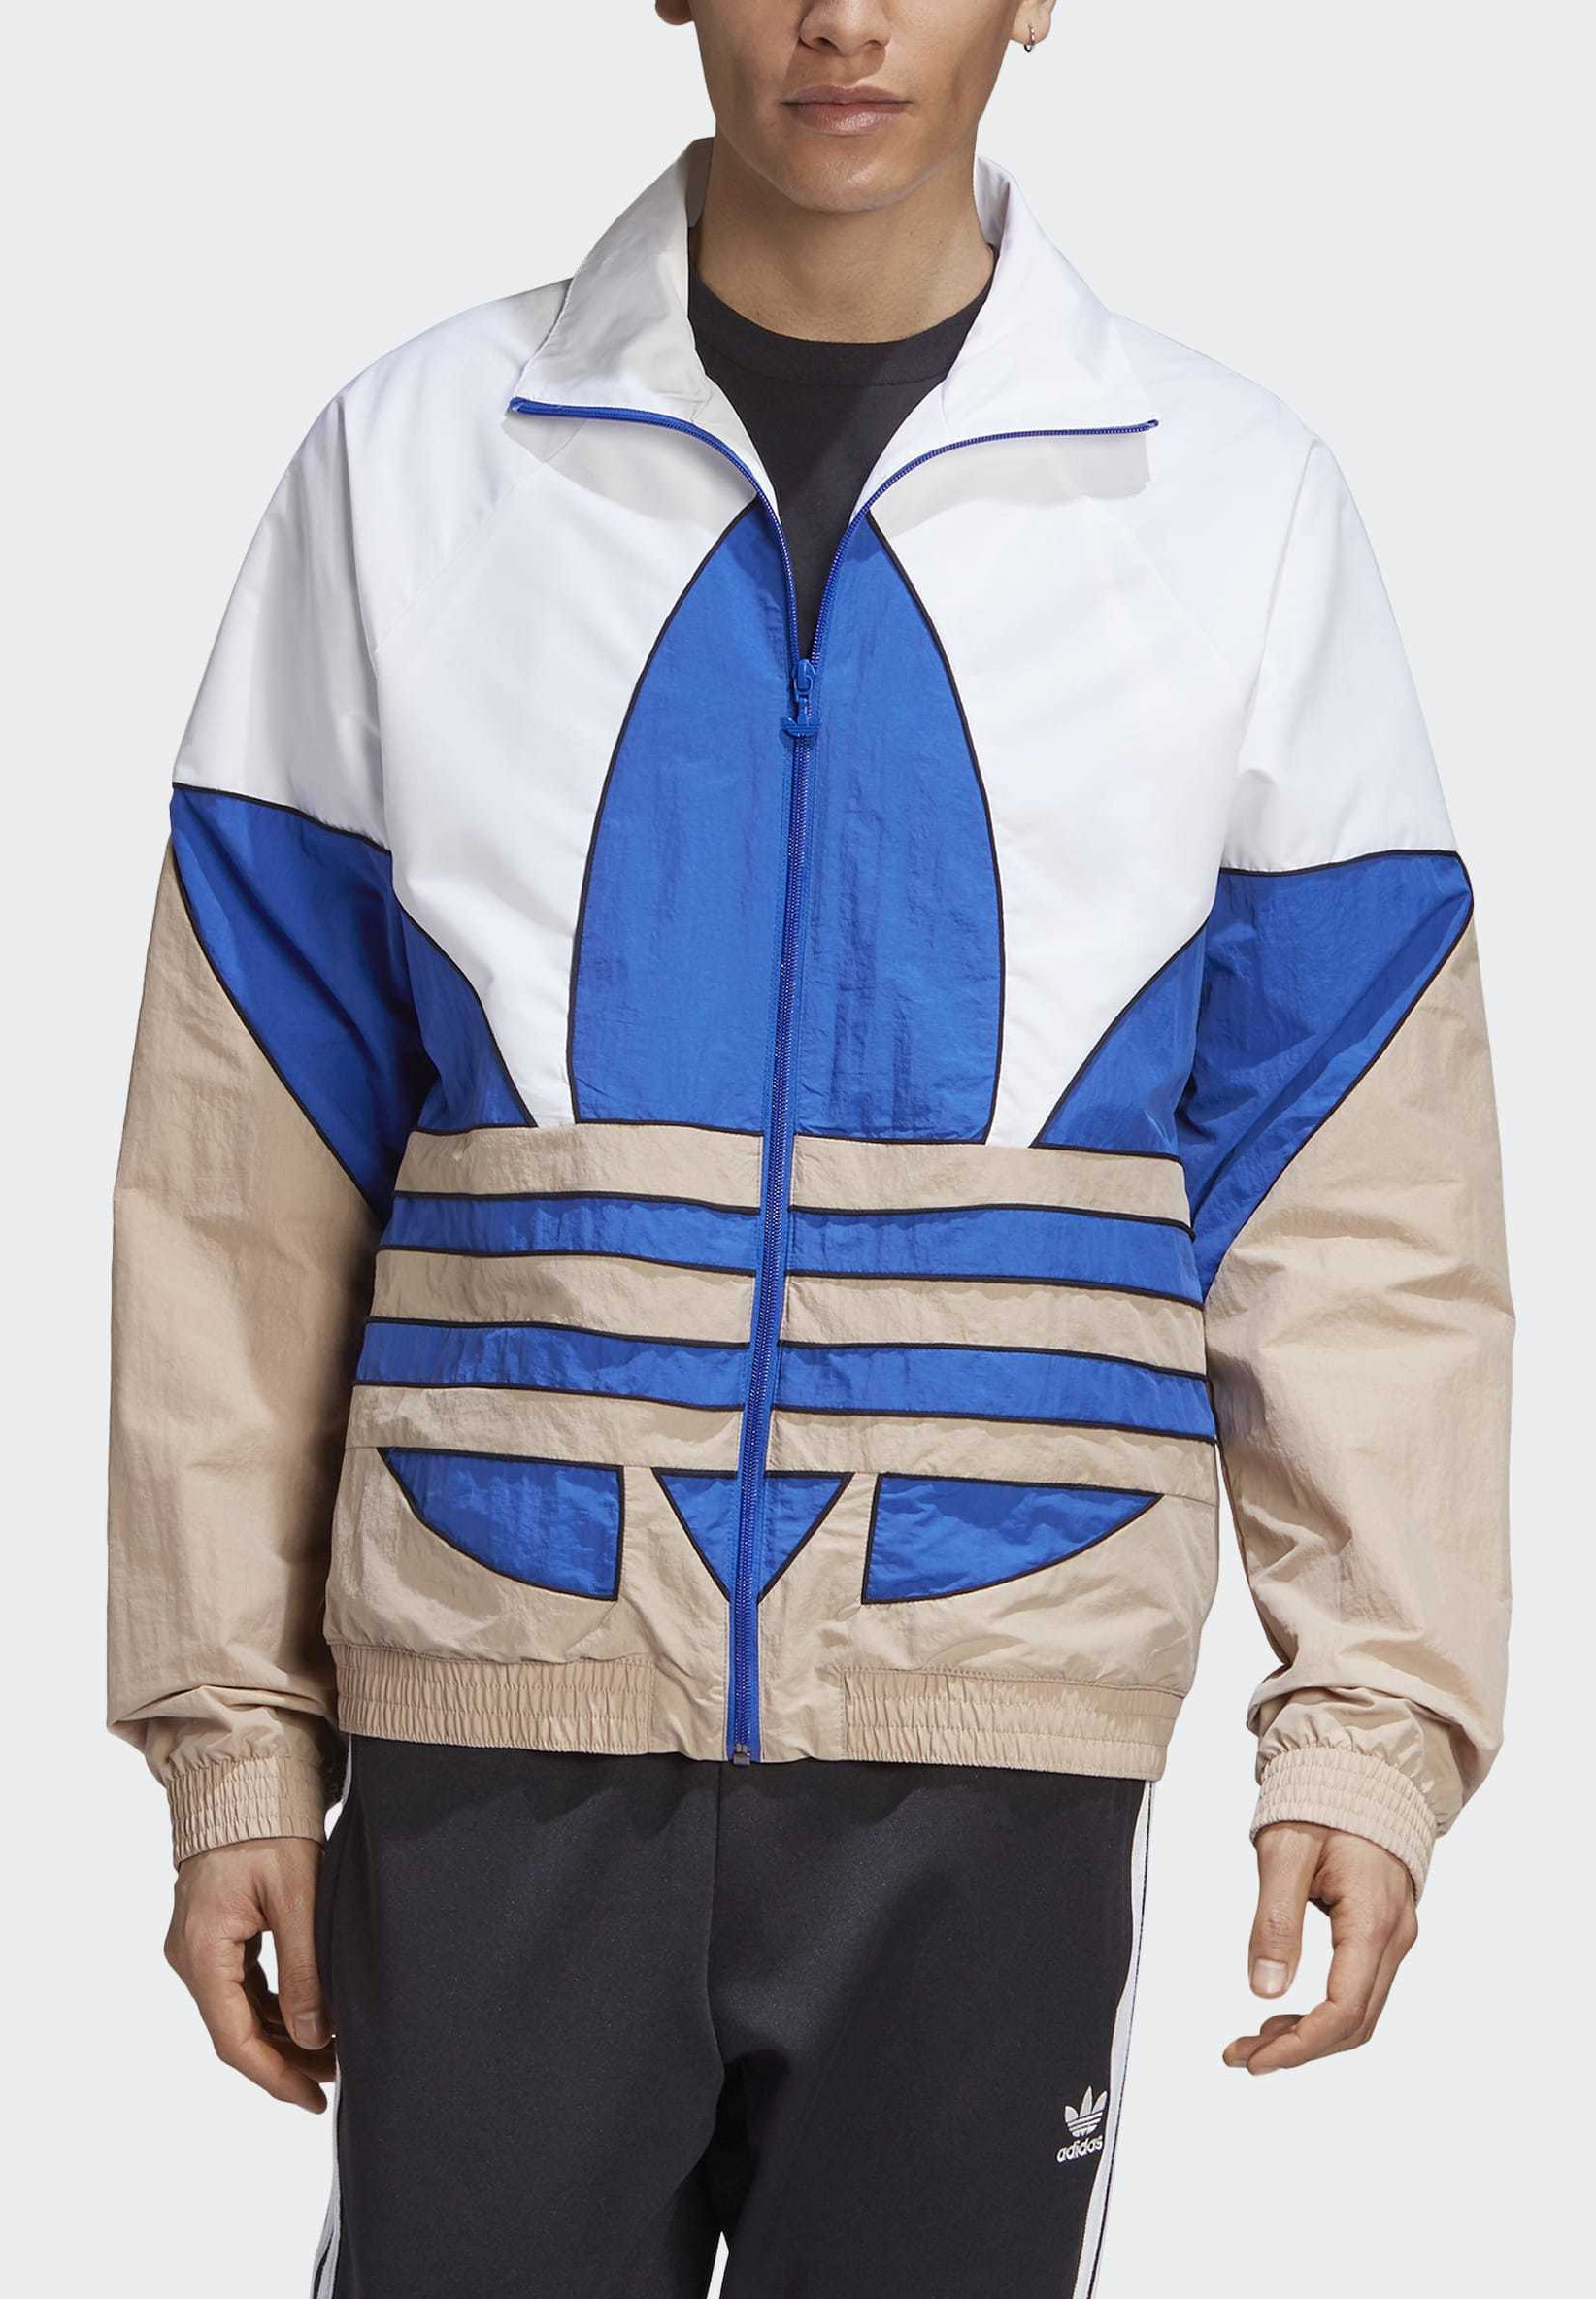 Adidas Originals Big Trefoil Woven Track Top - Giacca Sportiva White oQ7iw